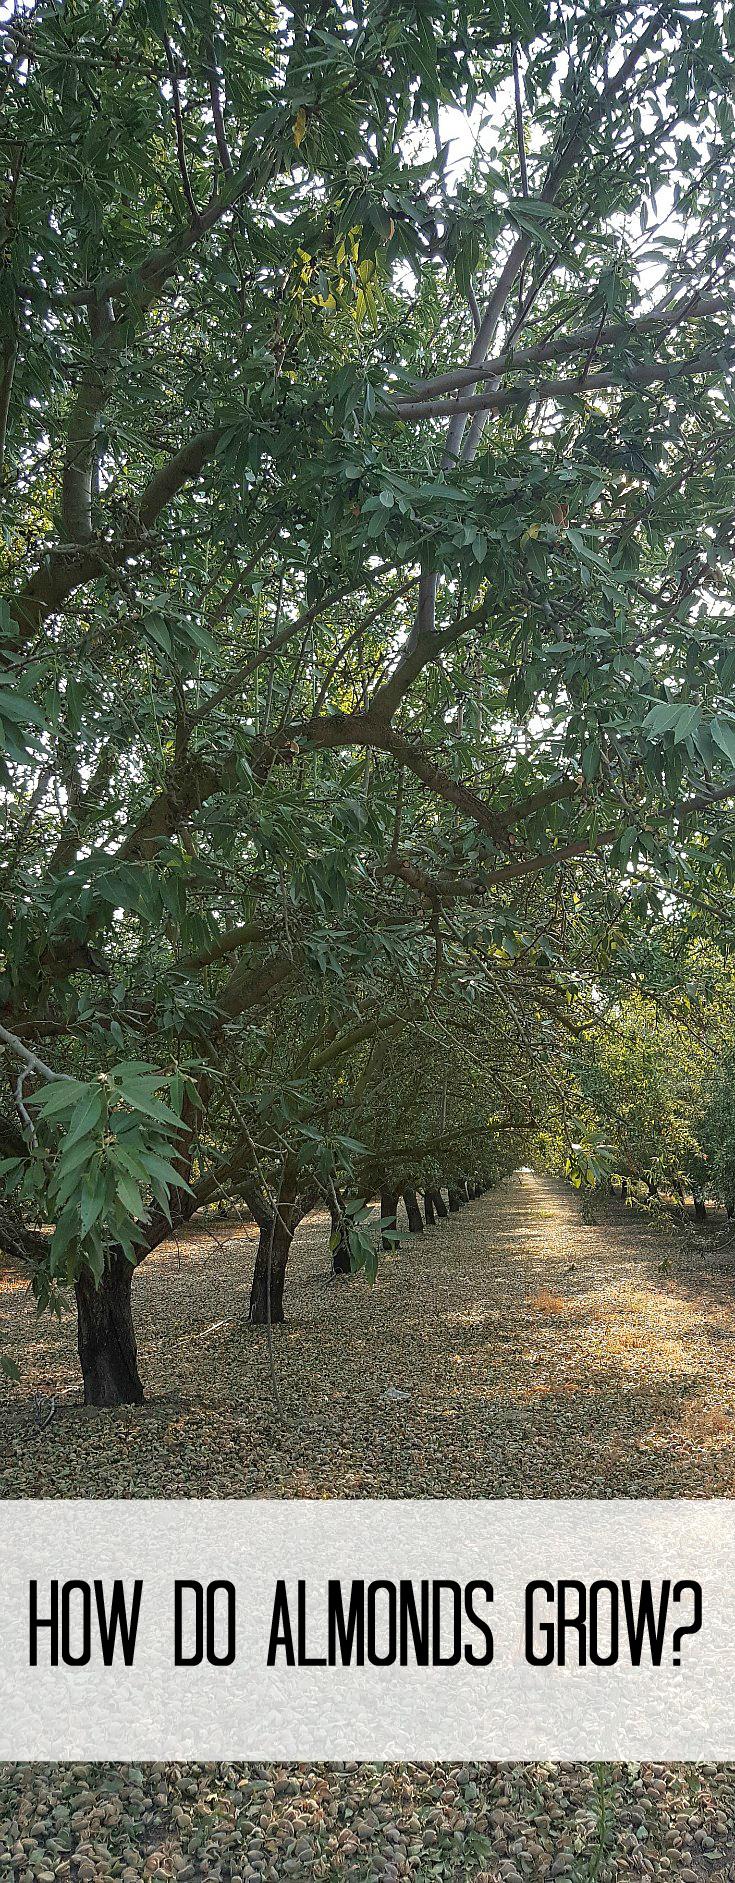 How do almonds grow?California Almond Farm Tour and 15 Delicious Almond Recipes